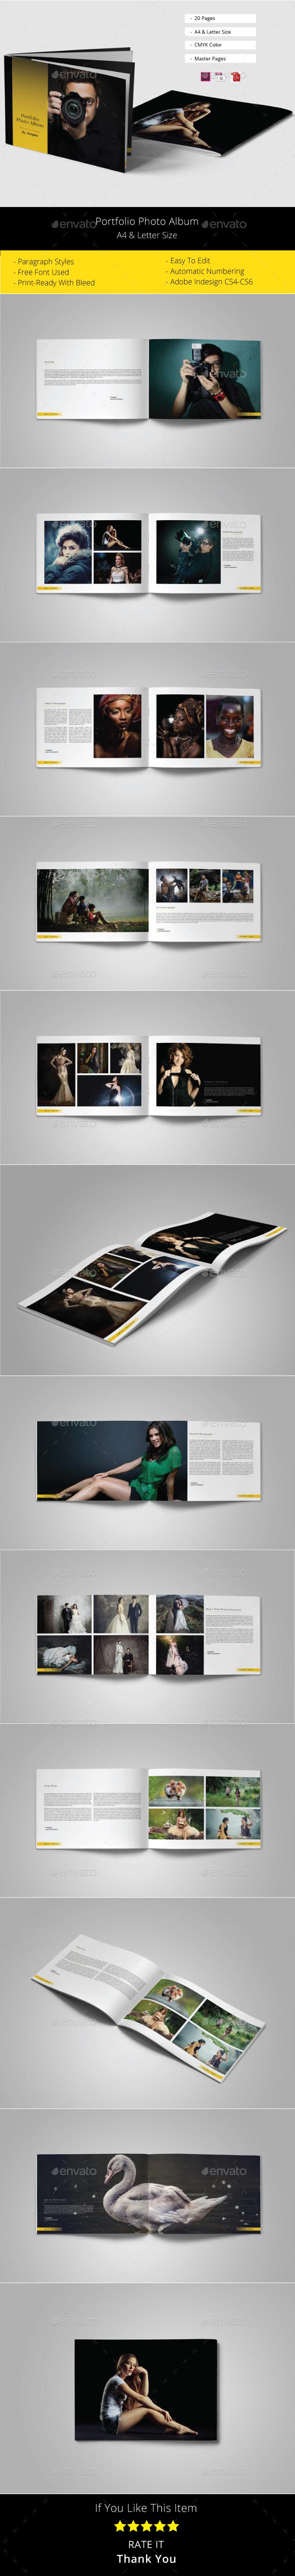 Portfolio Photo Album Template - Photo Albums Print Templates